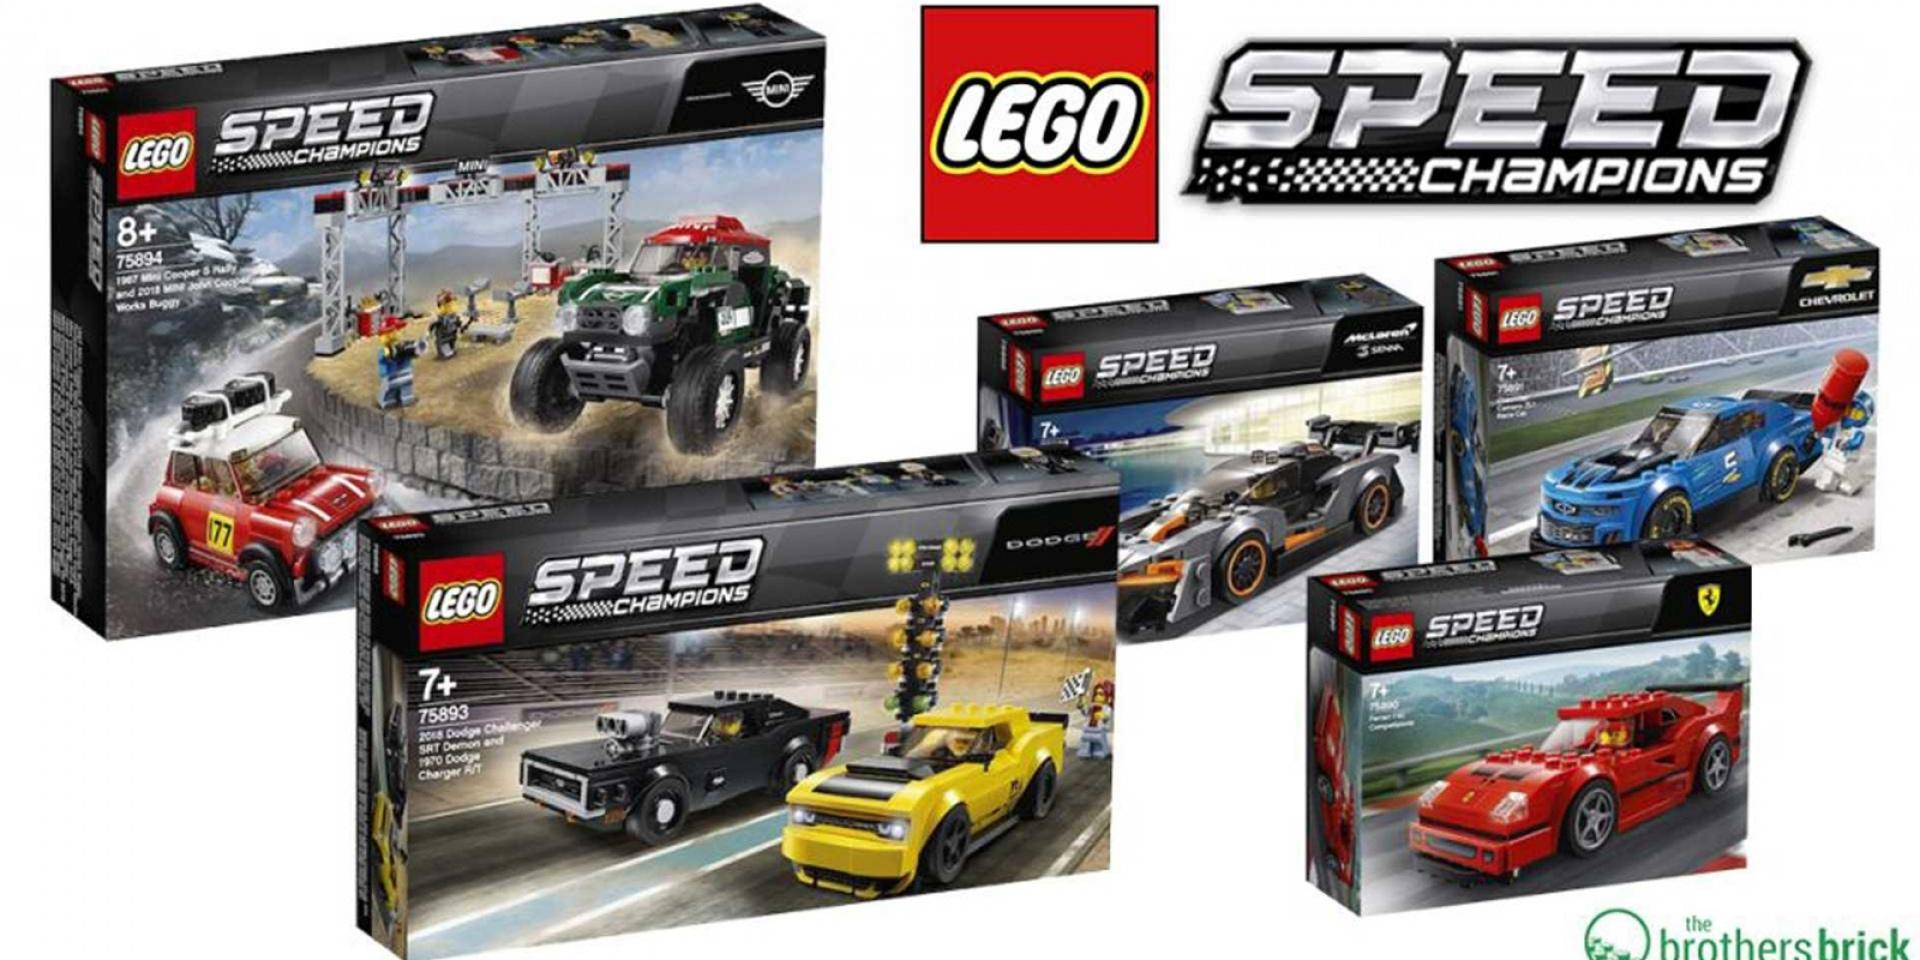 LEGO 2019 Speed Champions新車發表。McLaren Senna、Ferrari F40經典上市